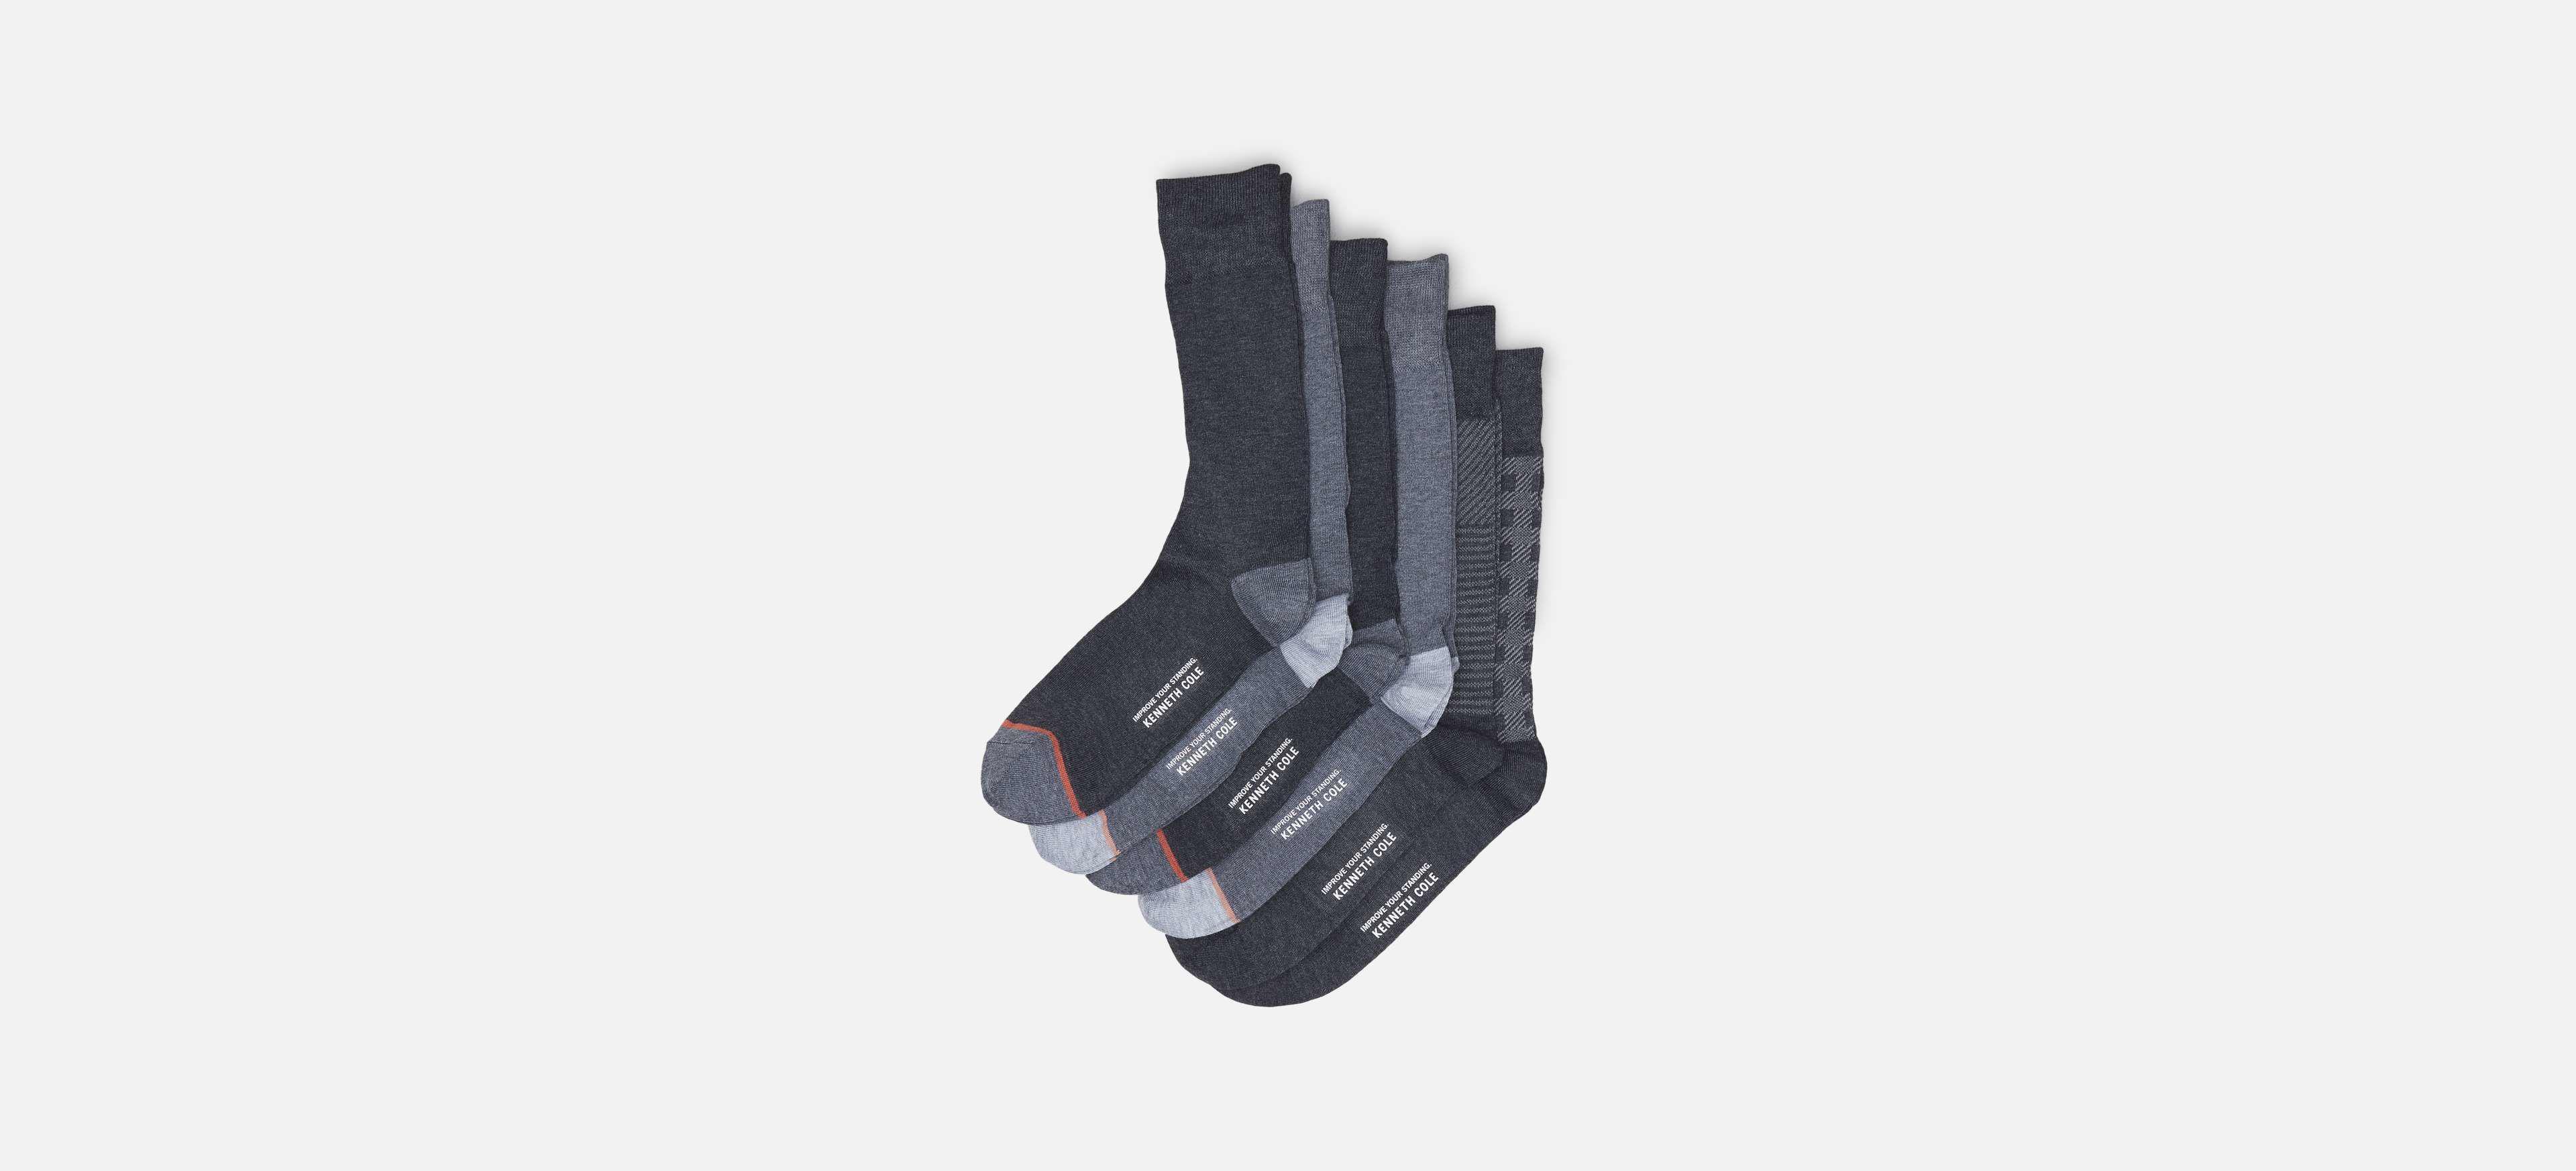 53c7613946 Lyst - Kenneth Cole Reaction Four Pack Dress Crew Socks - Stripe ...